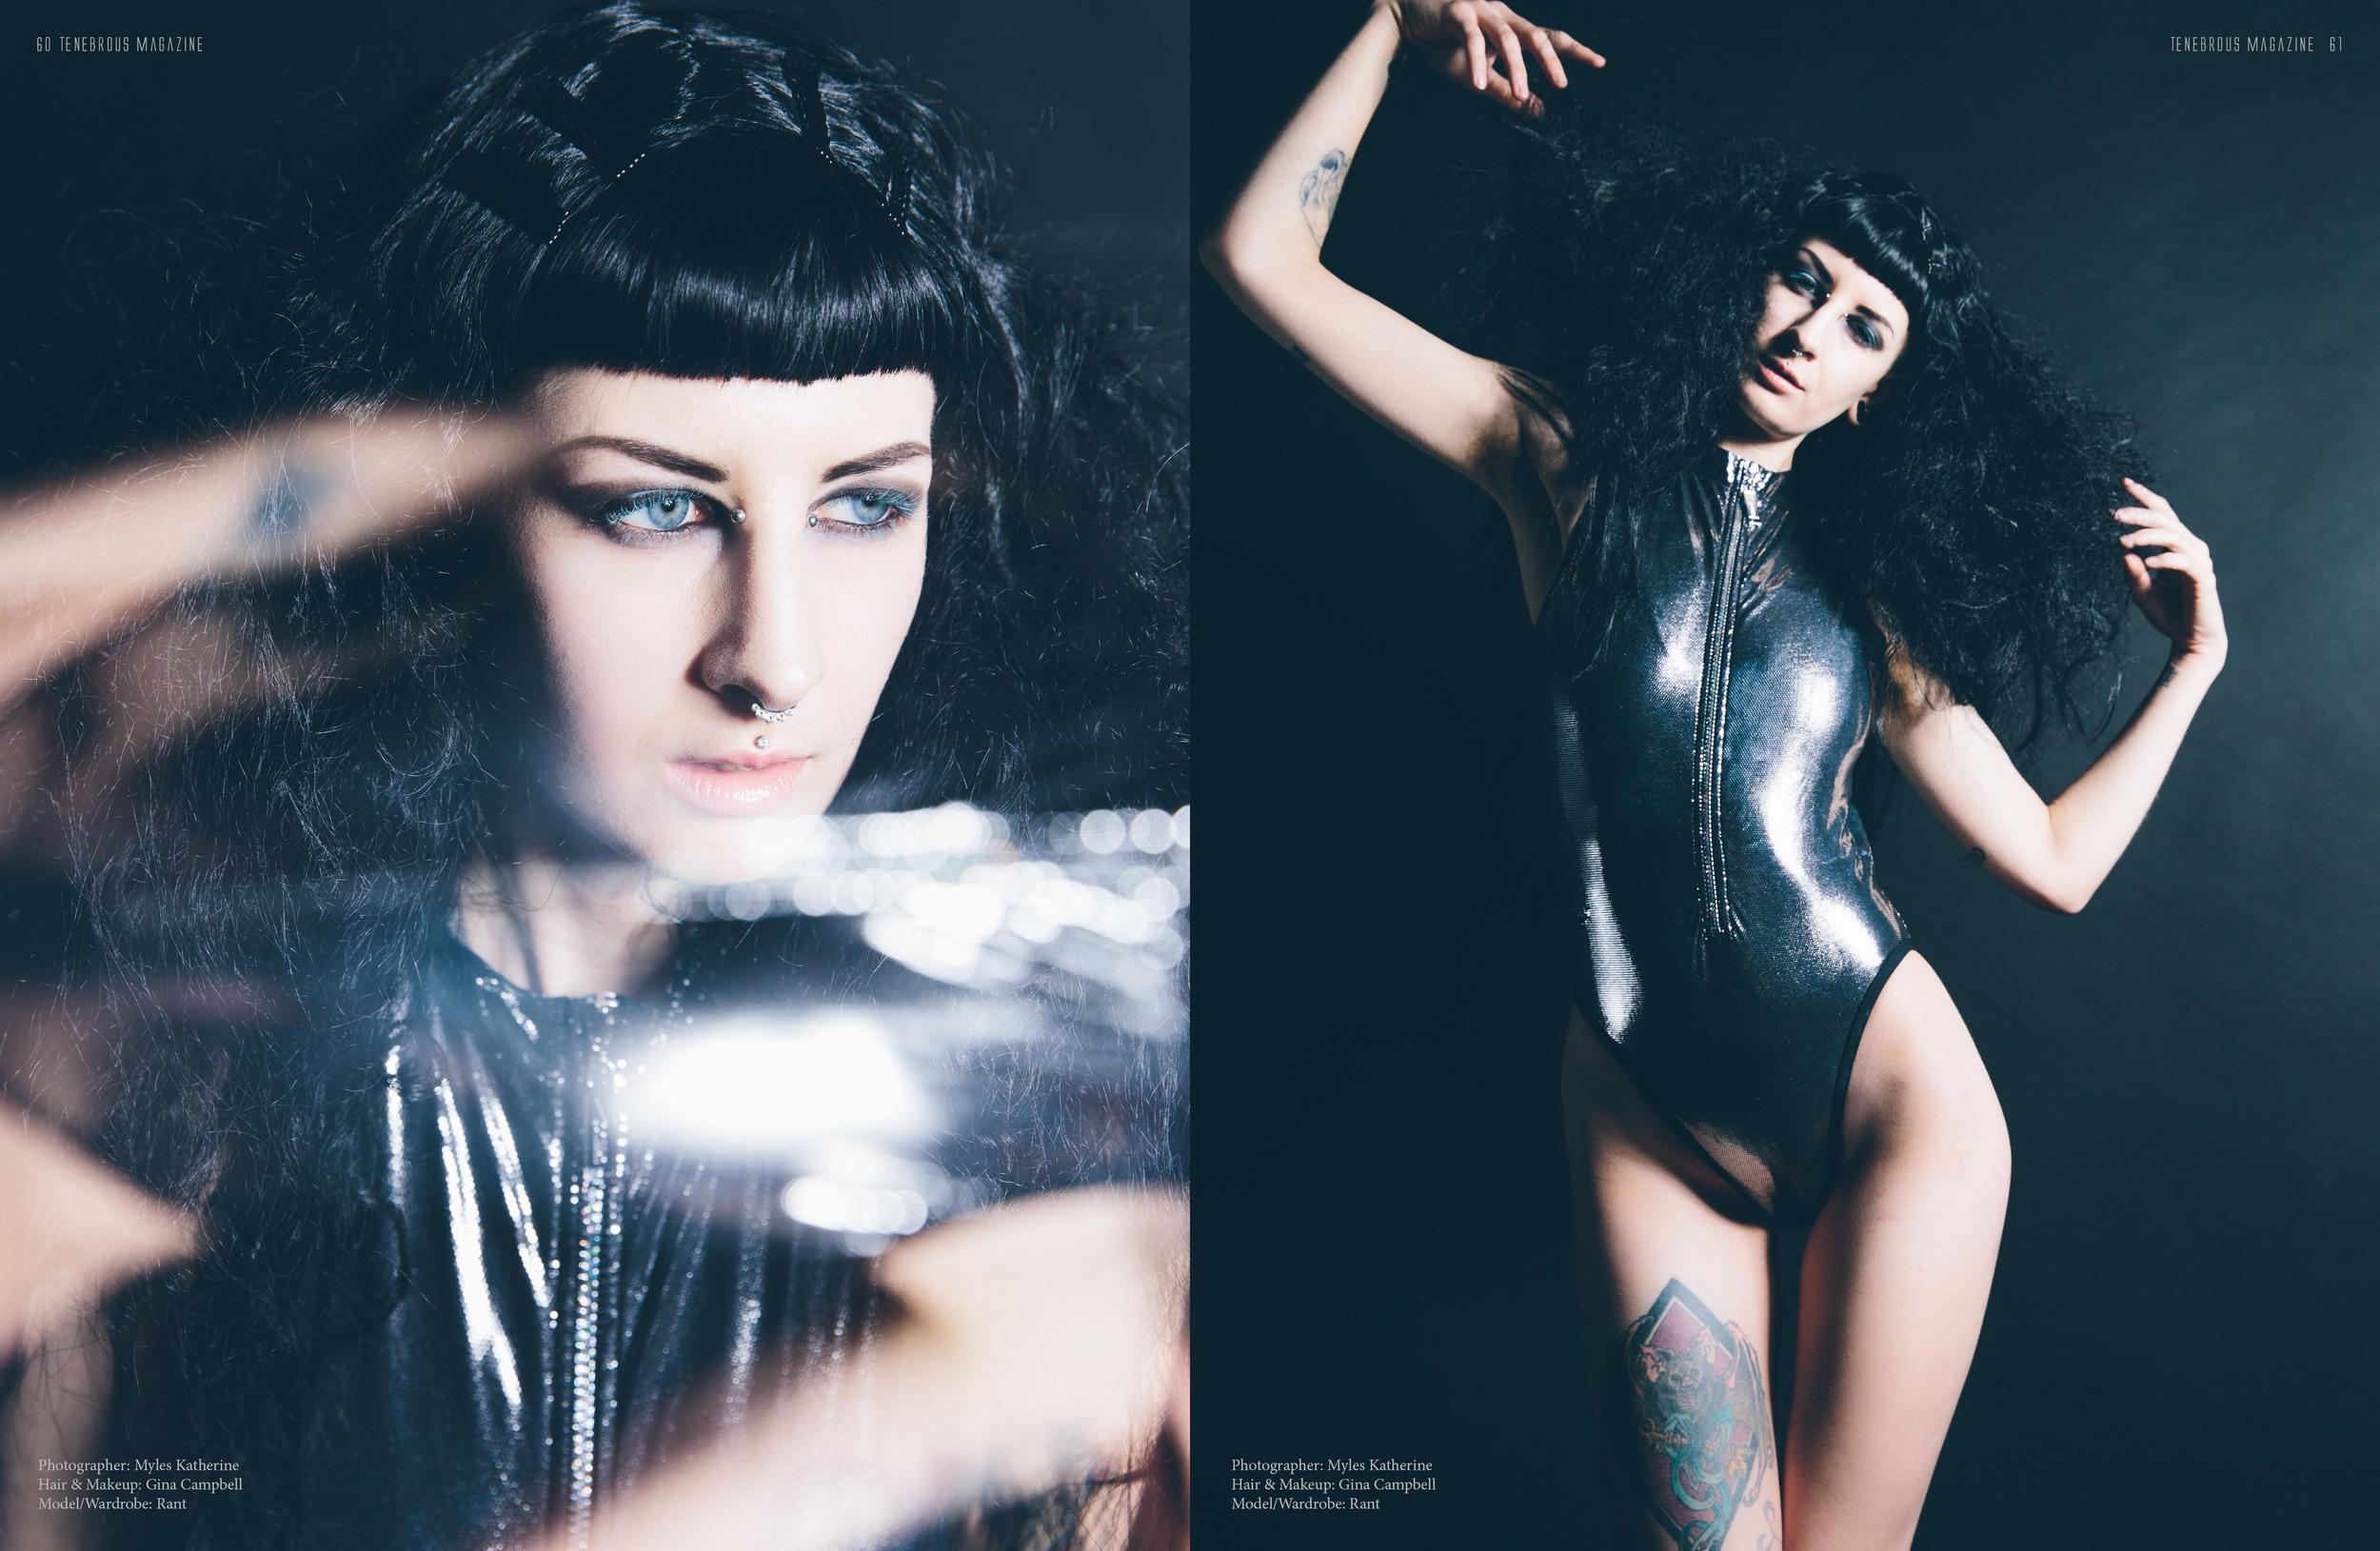 Tenebrous Magazine  Model: Rant  Photography:  Myles Katherine Photography